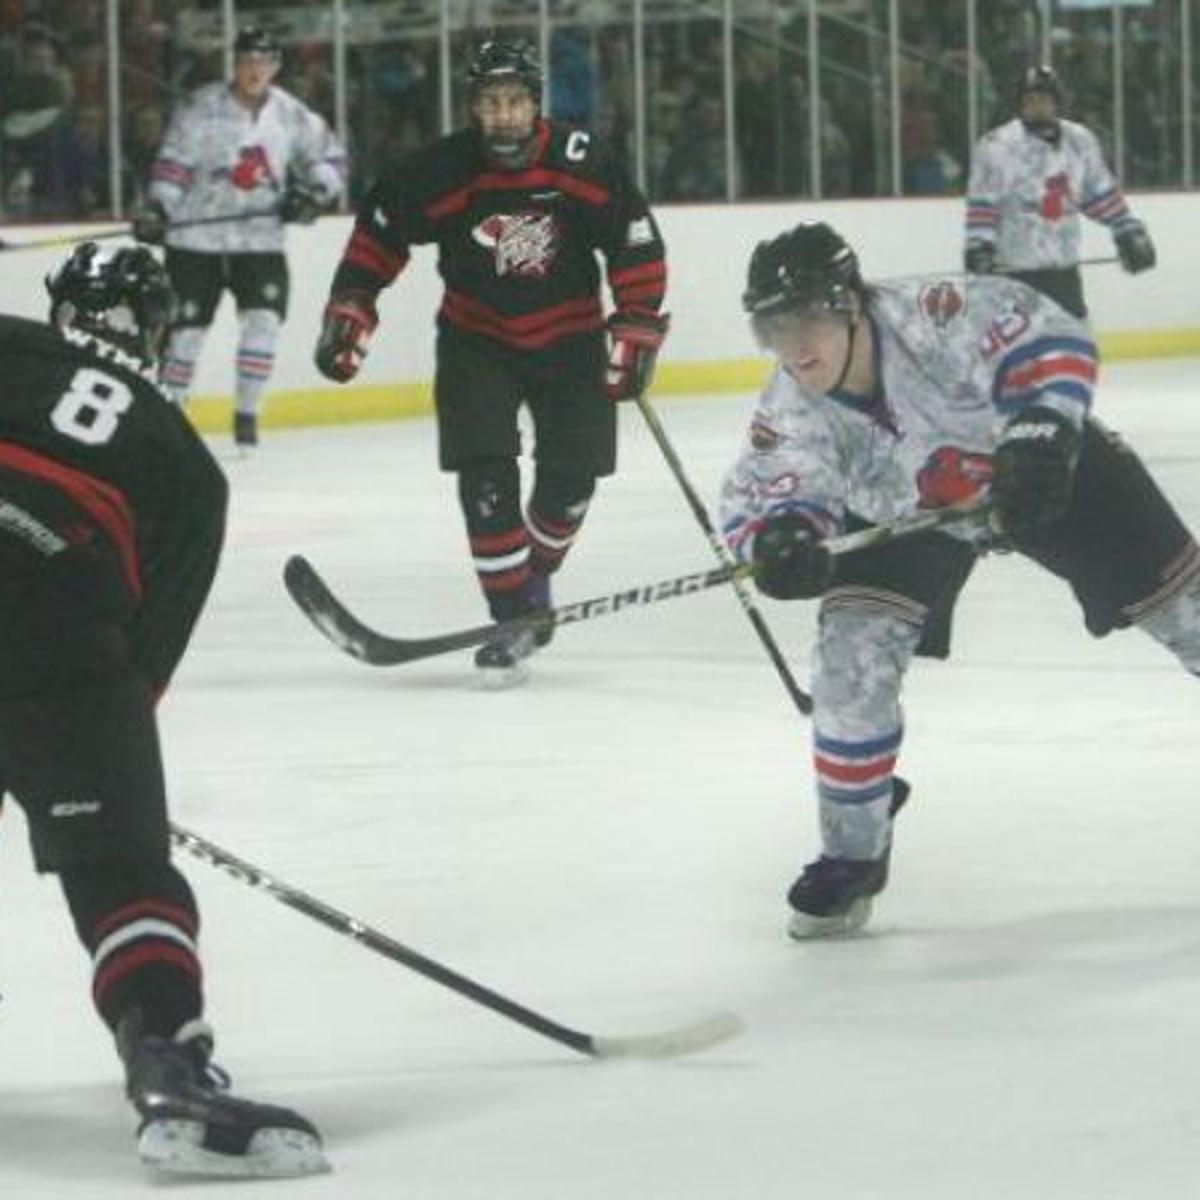 Kids Are Big Winners In Charity Hockey Game Mason City North Iowa Globegazette Com